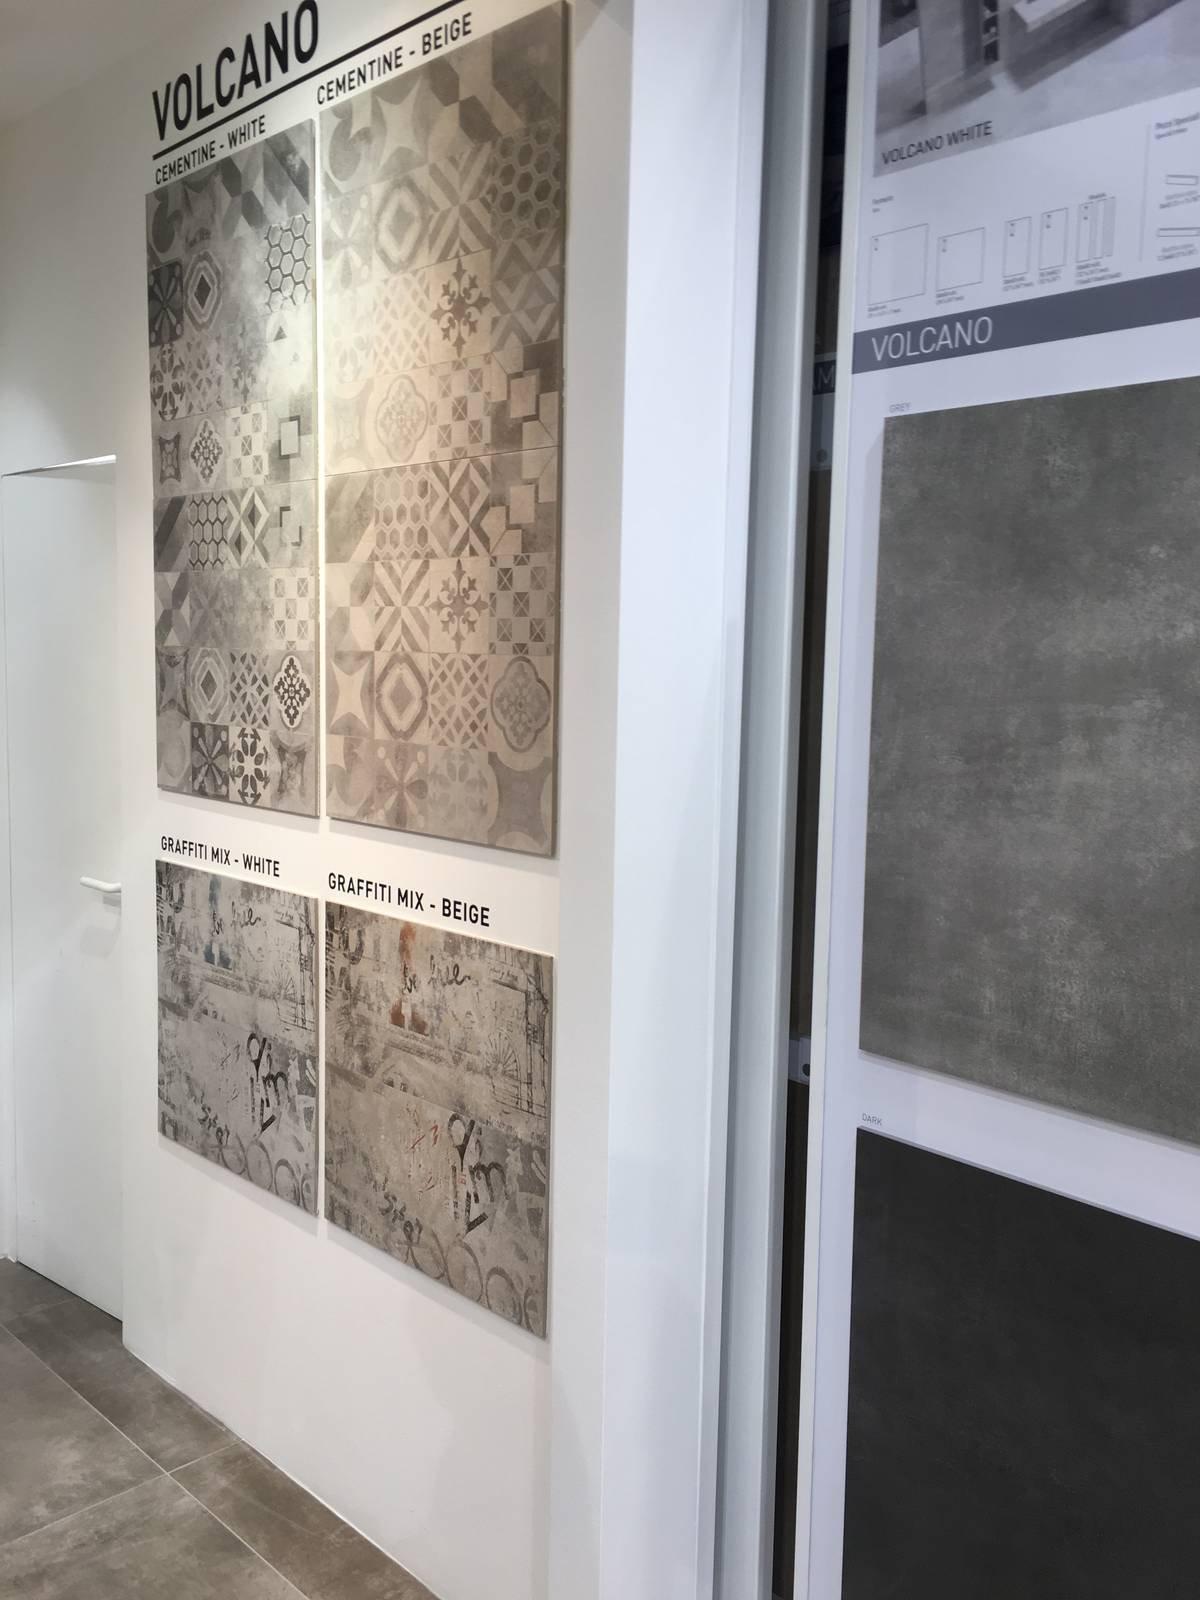 Ceramica rondine cersaie 2017 cose di casa for Ceramica rondine